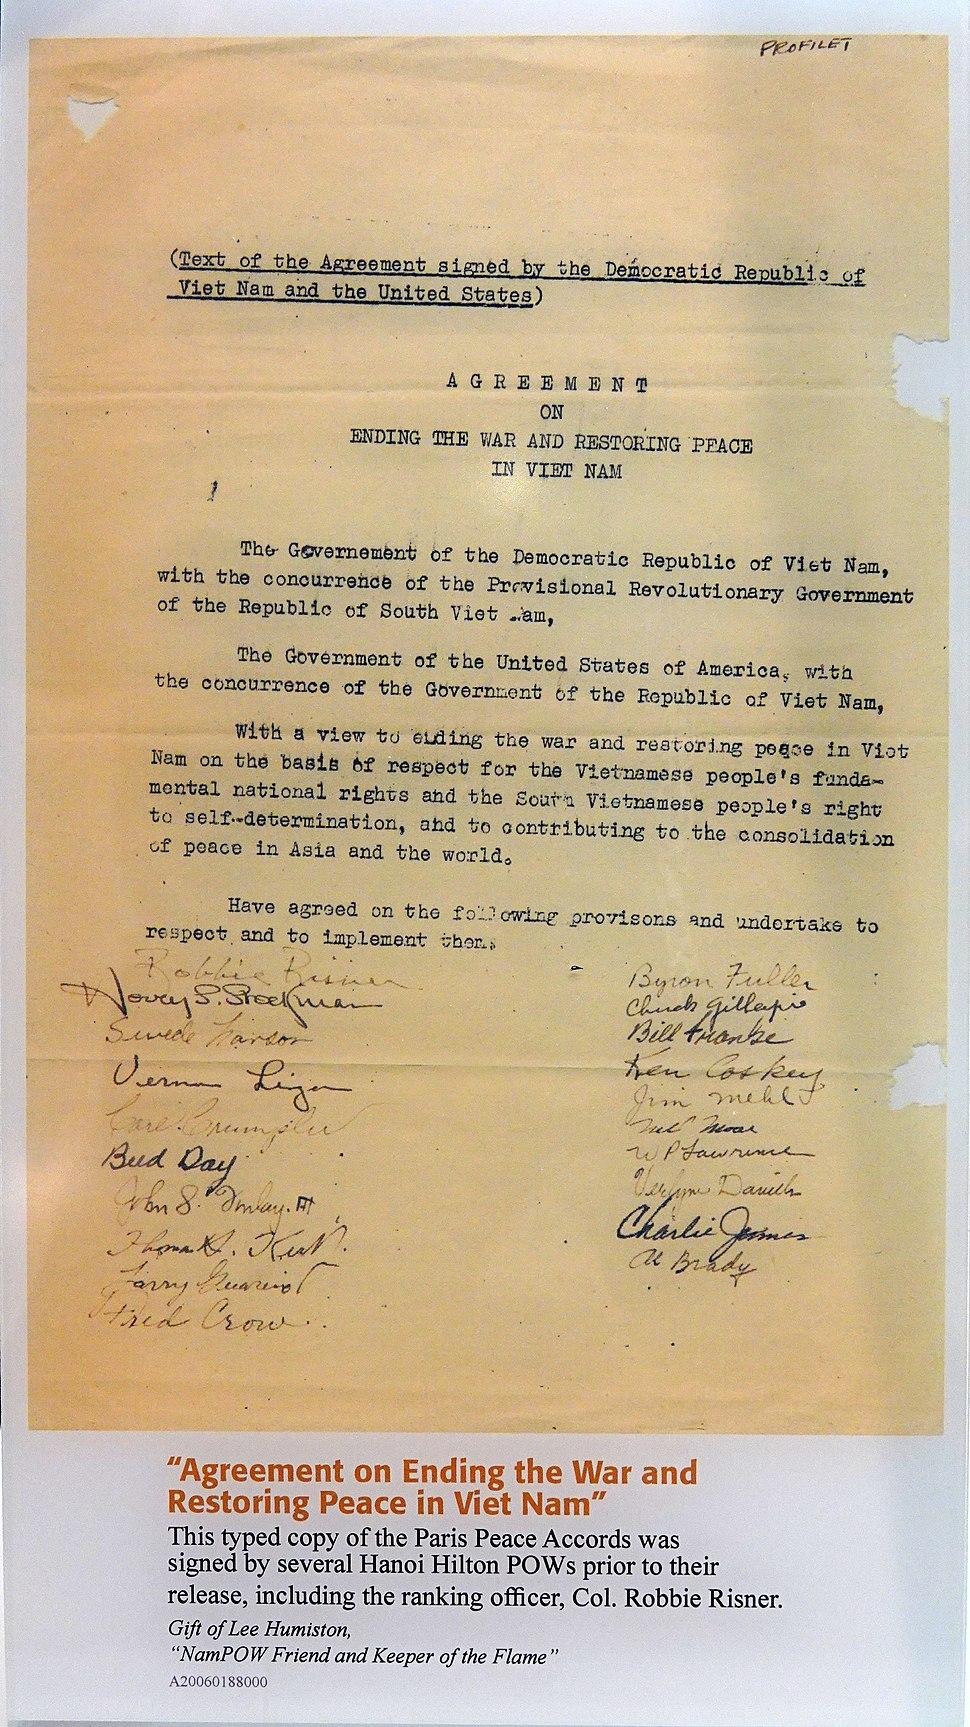 Vietnam Peace Treaty 1973